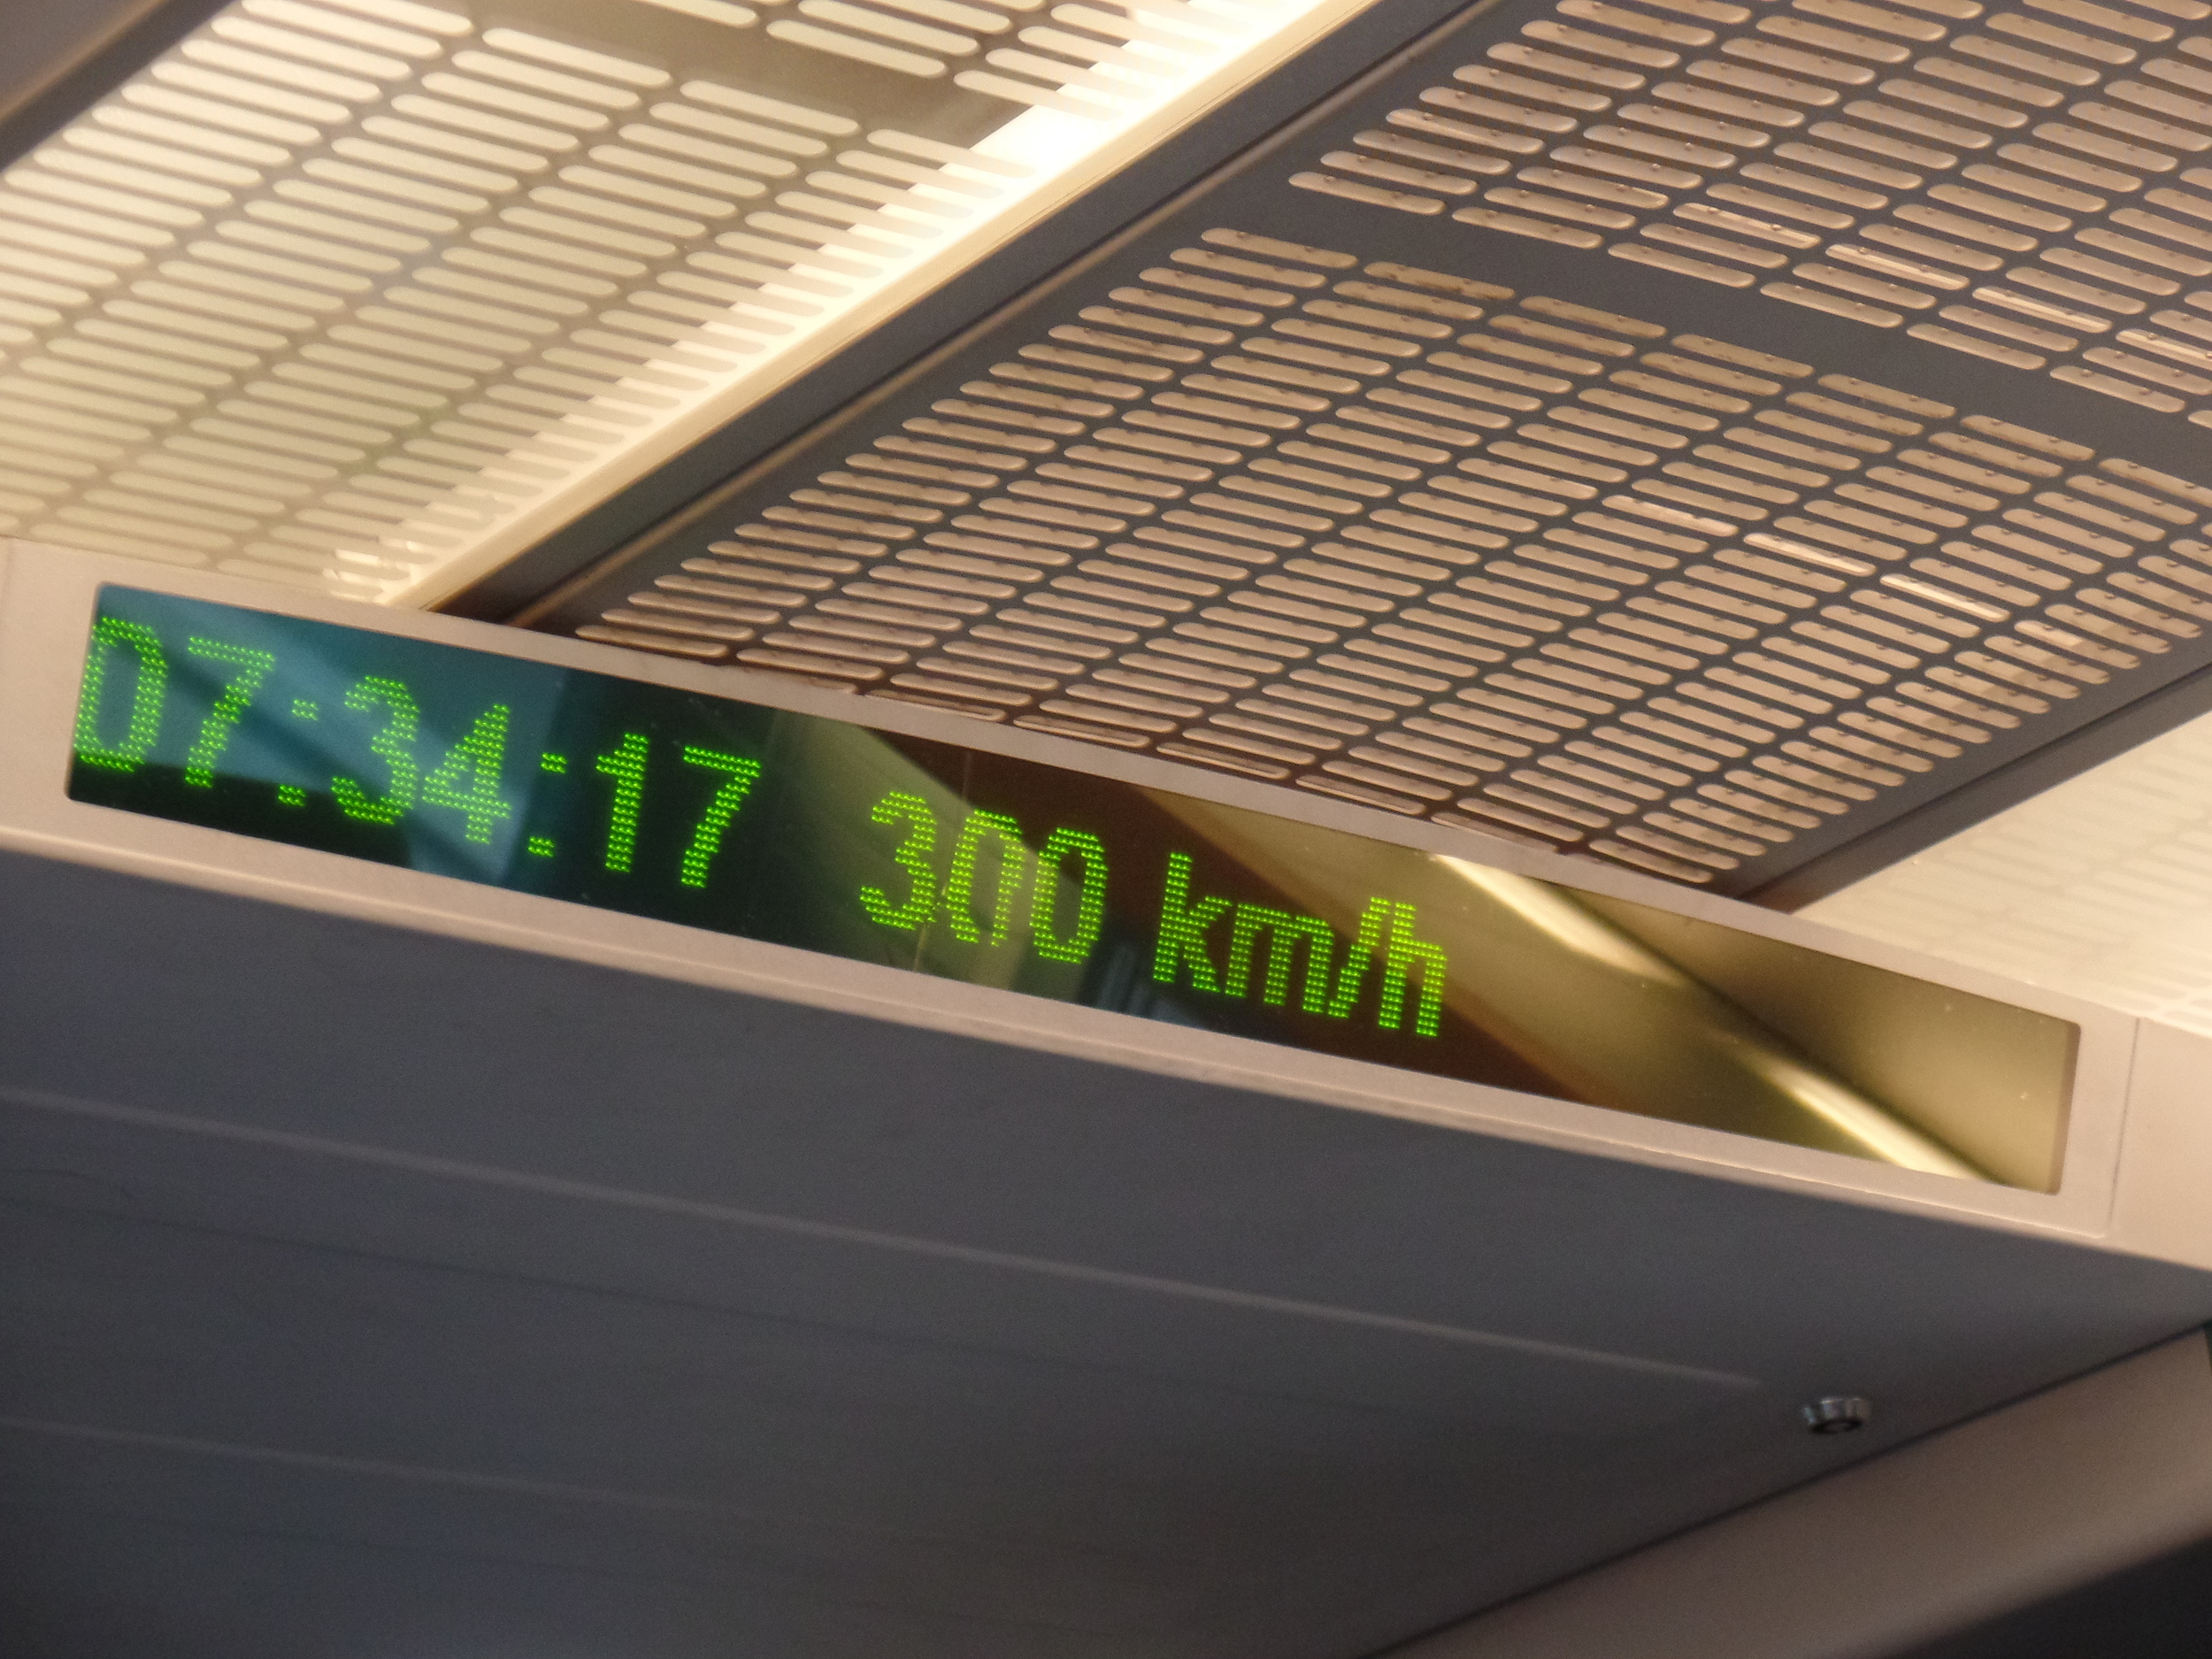 The Maglev train - it's fast!